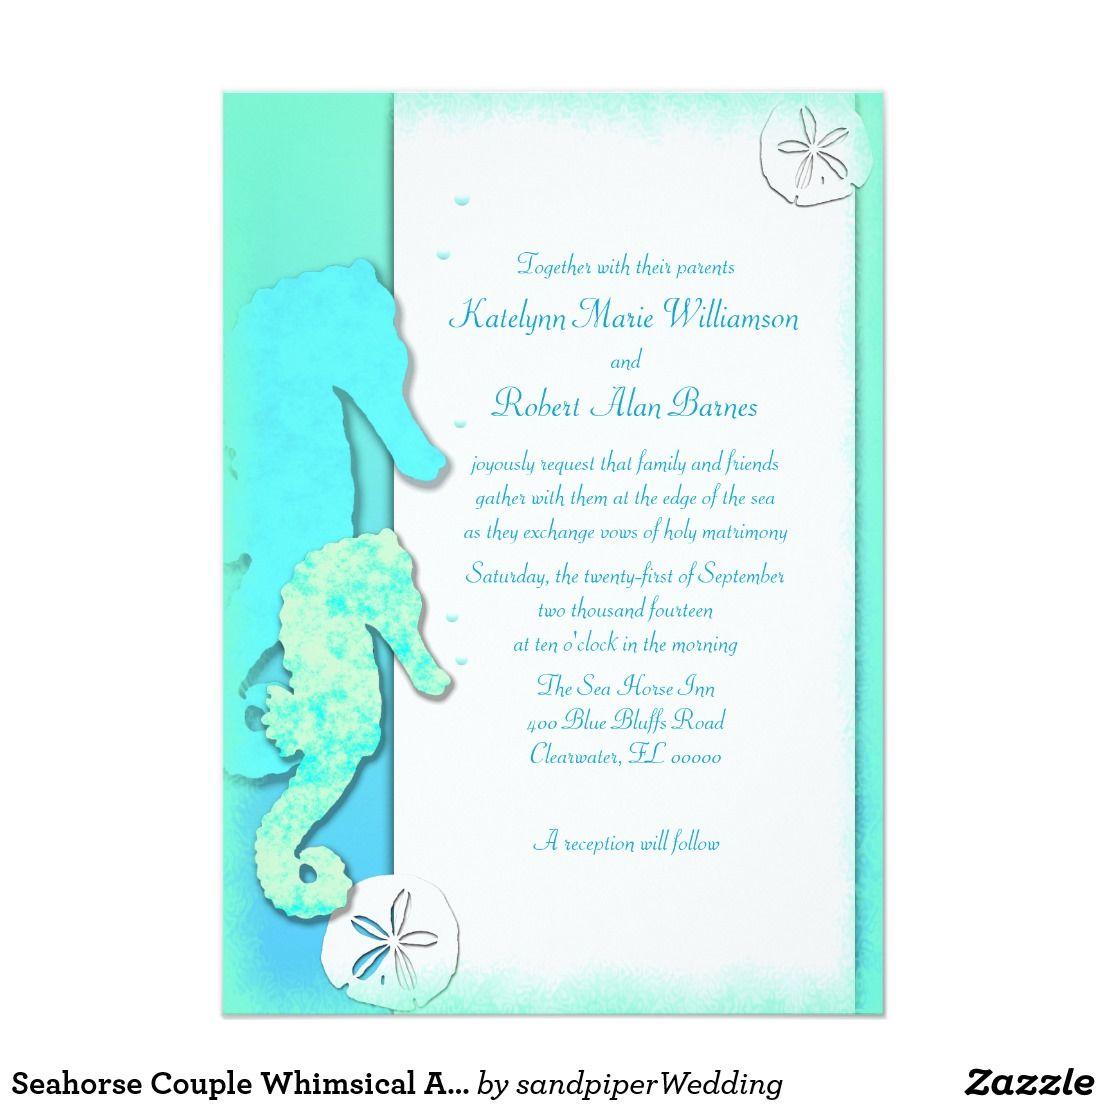 Seahorse Couple Whimsical Aqua Wedding Card | Seahorses, Wedding and ...